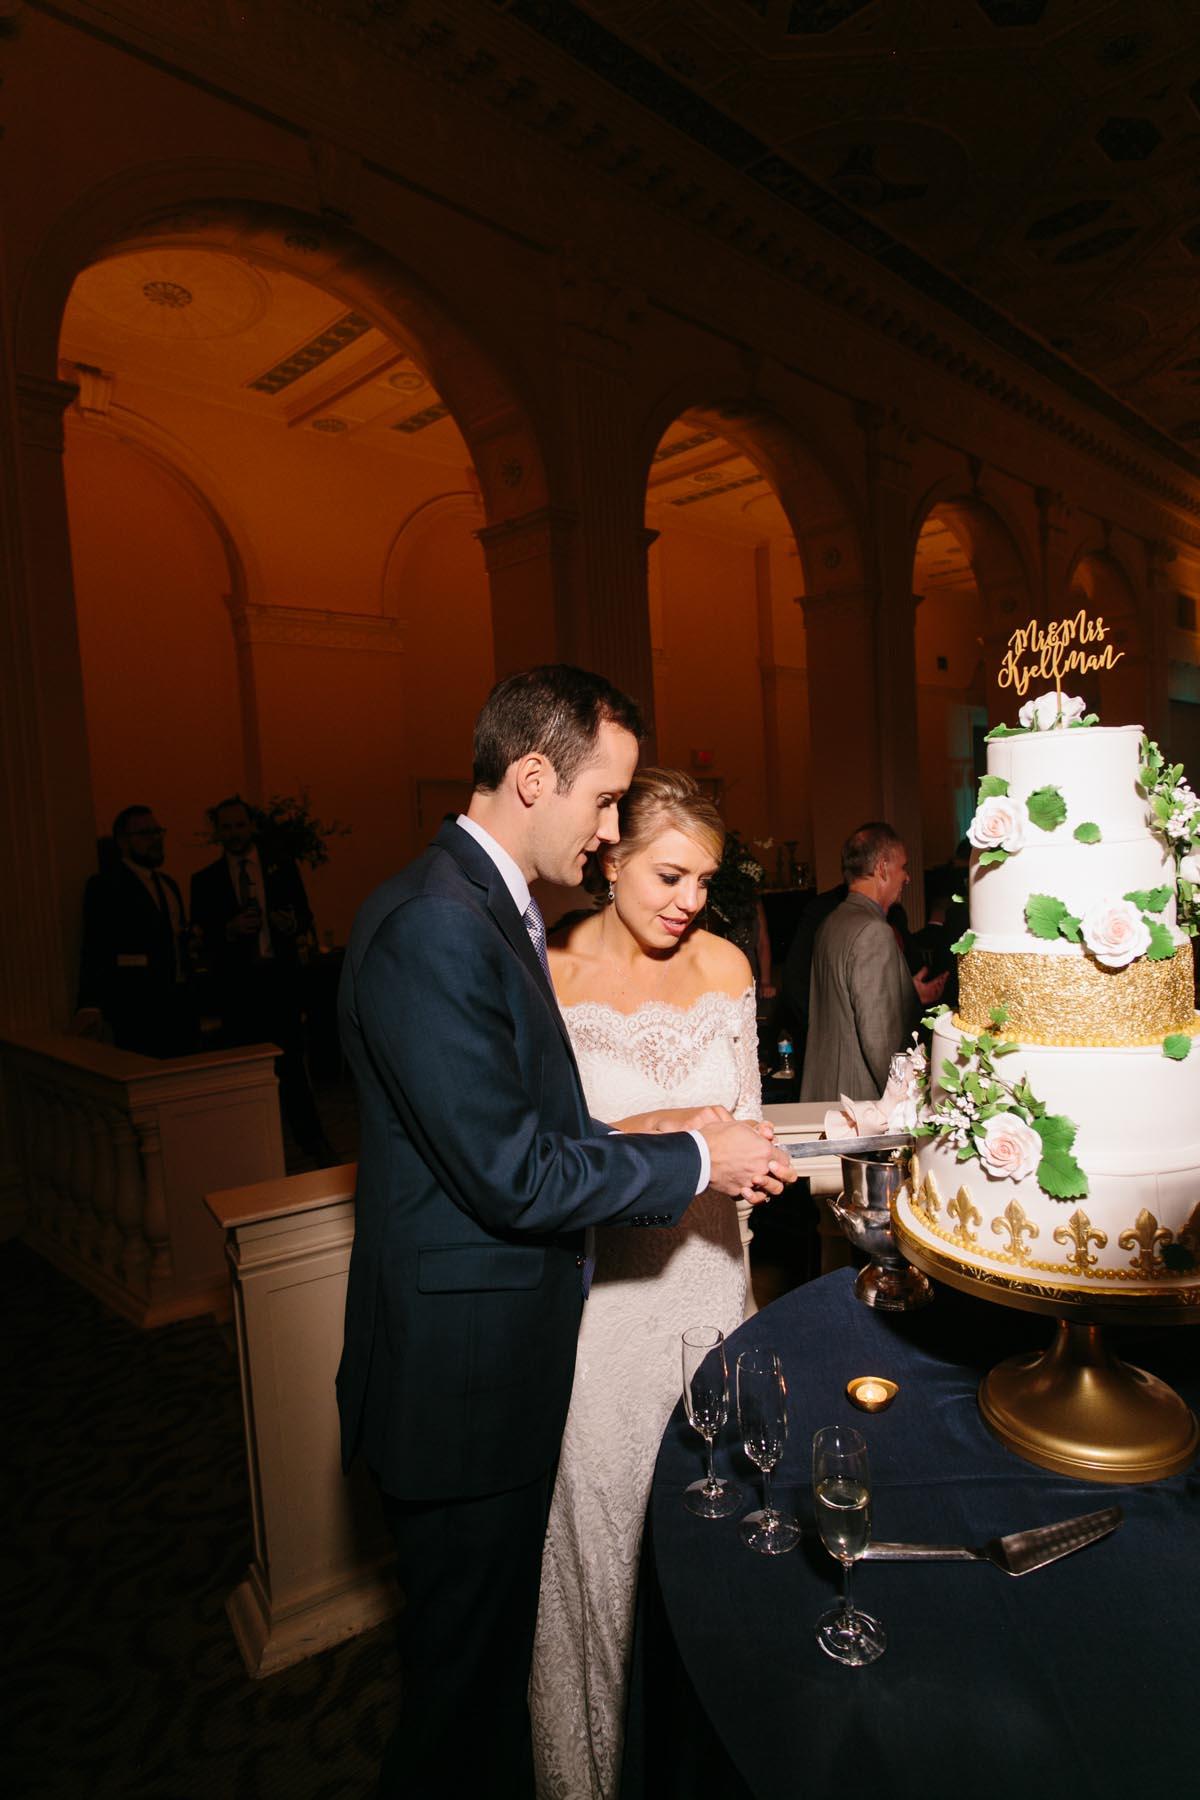 kjellman wedding blog biltmore wedding -106